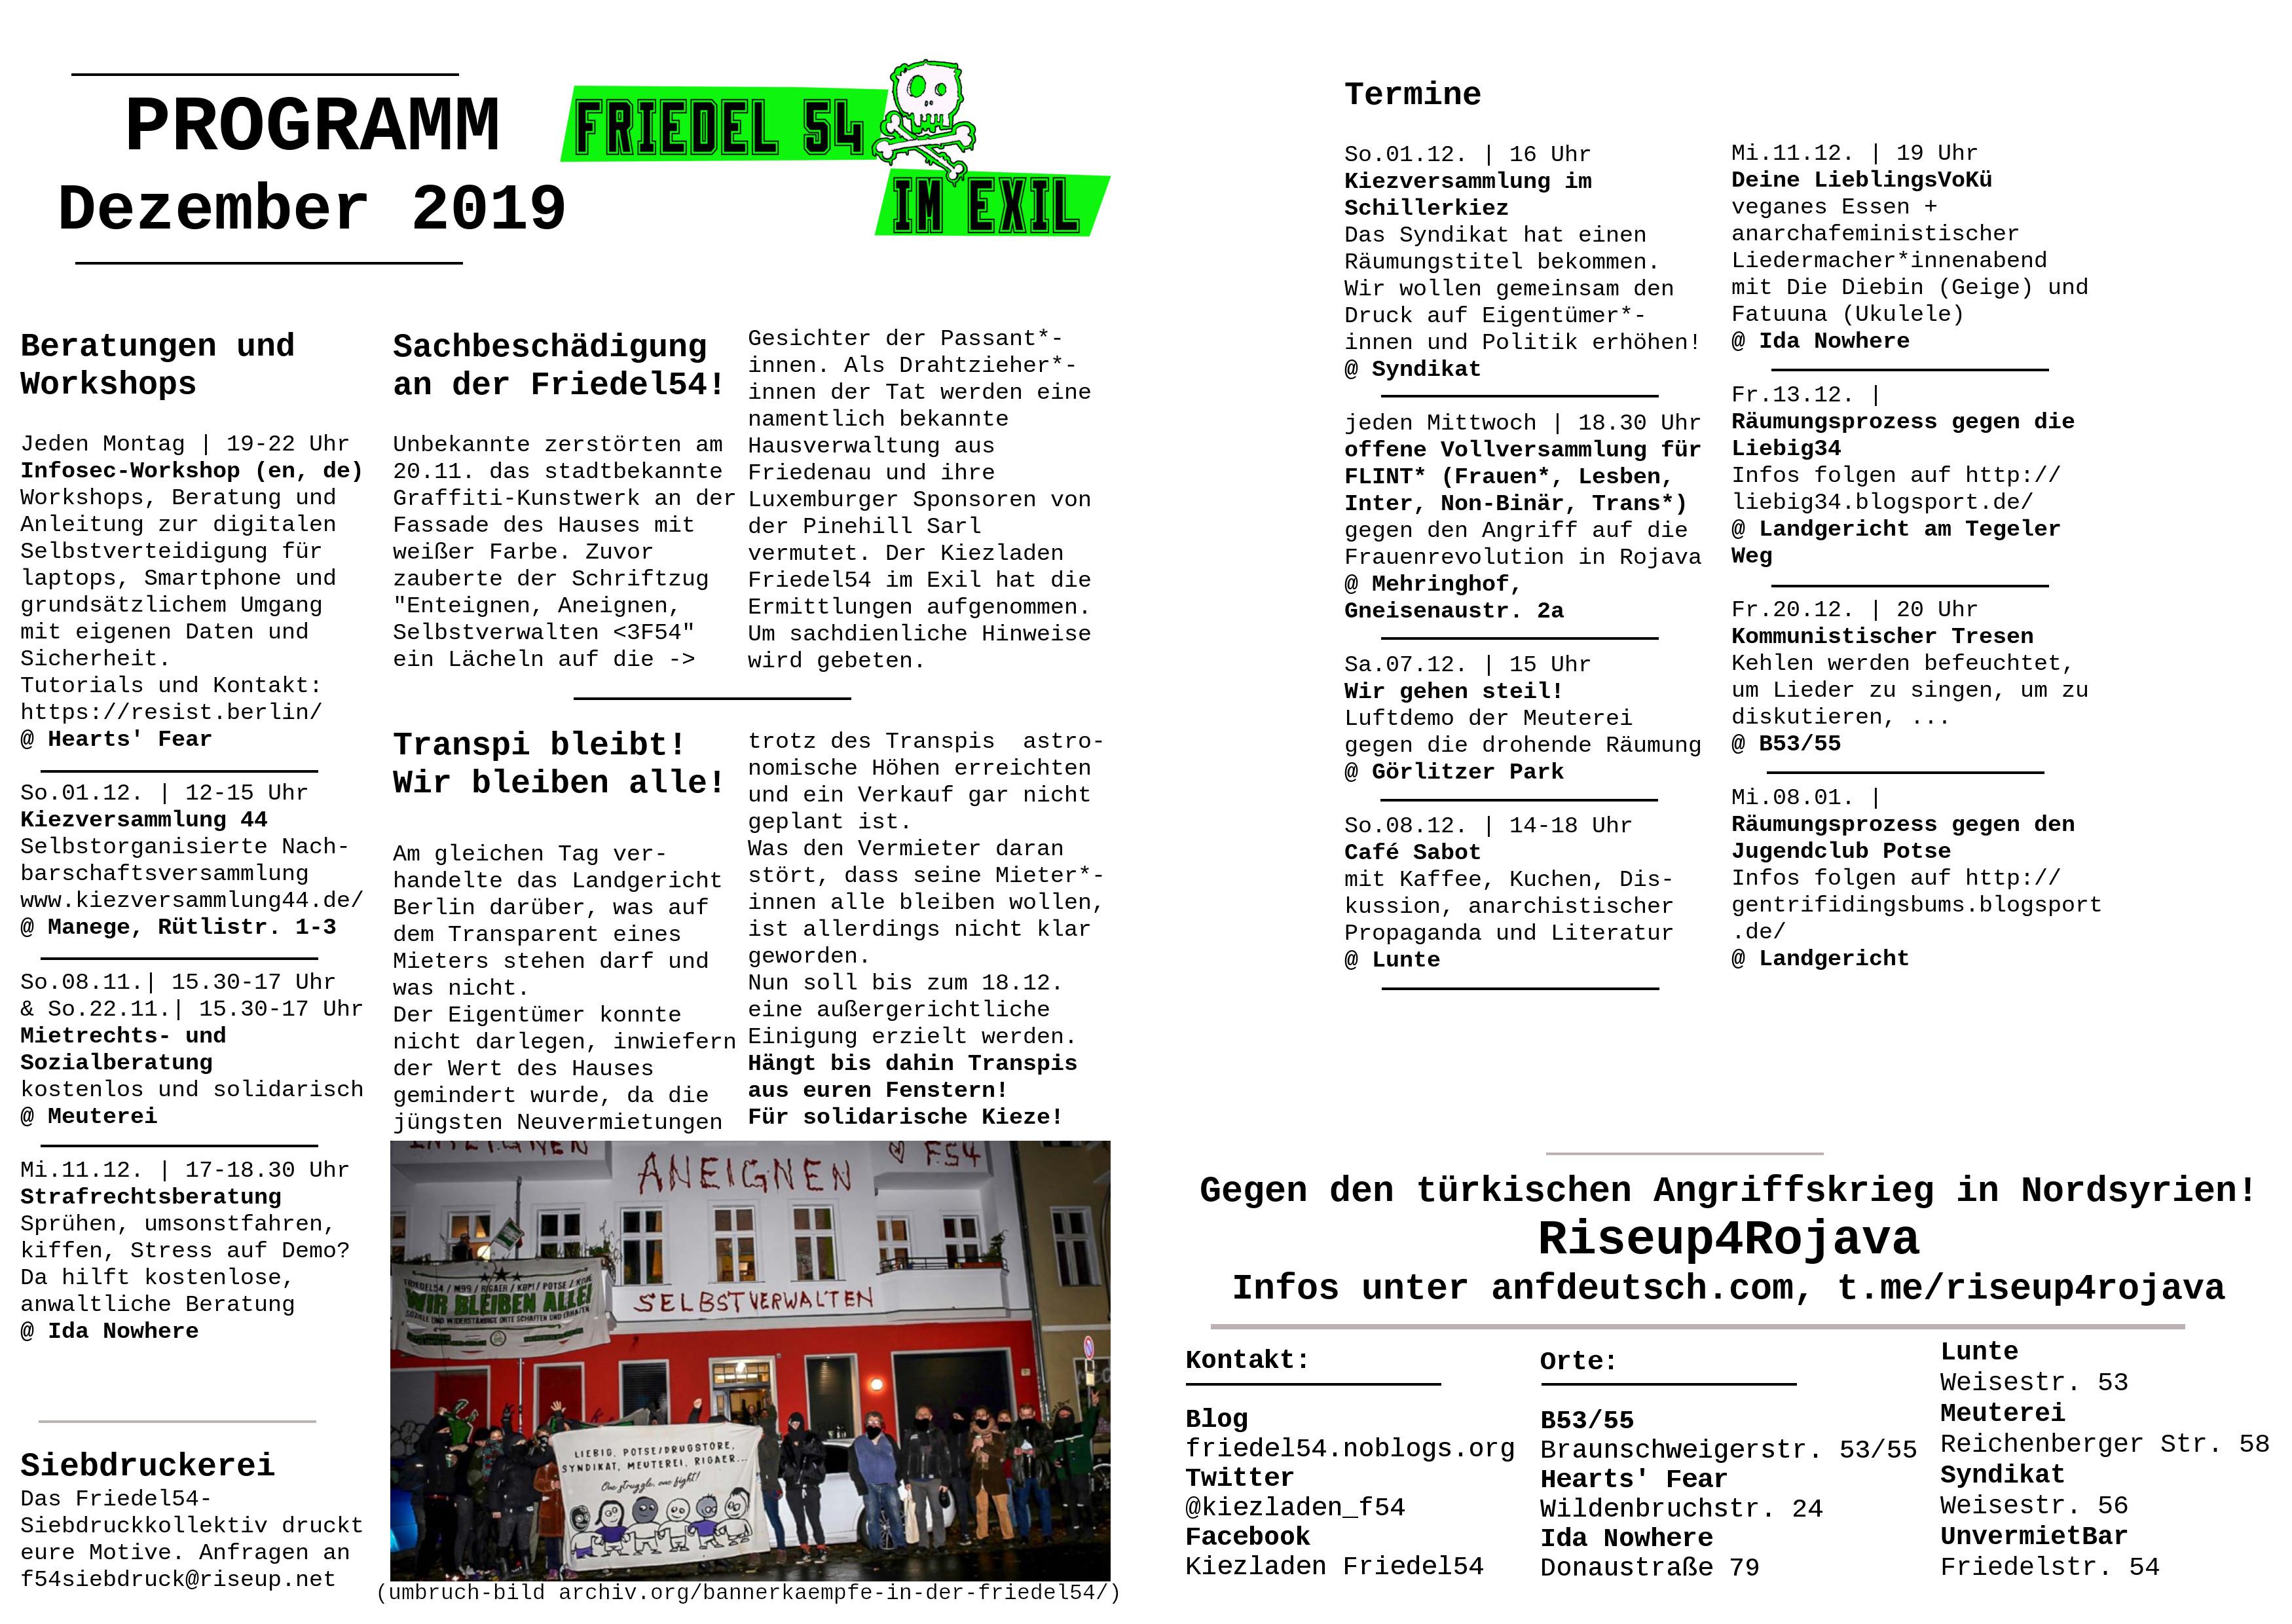 Friedel54 im Exil – Monatsprogramm Dezember 2019